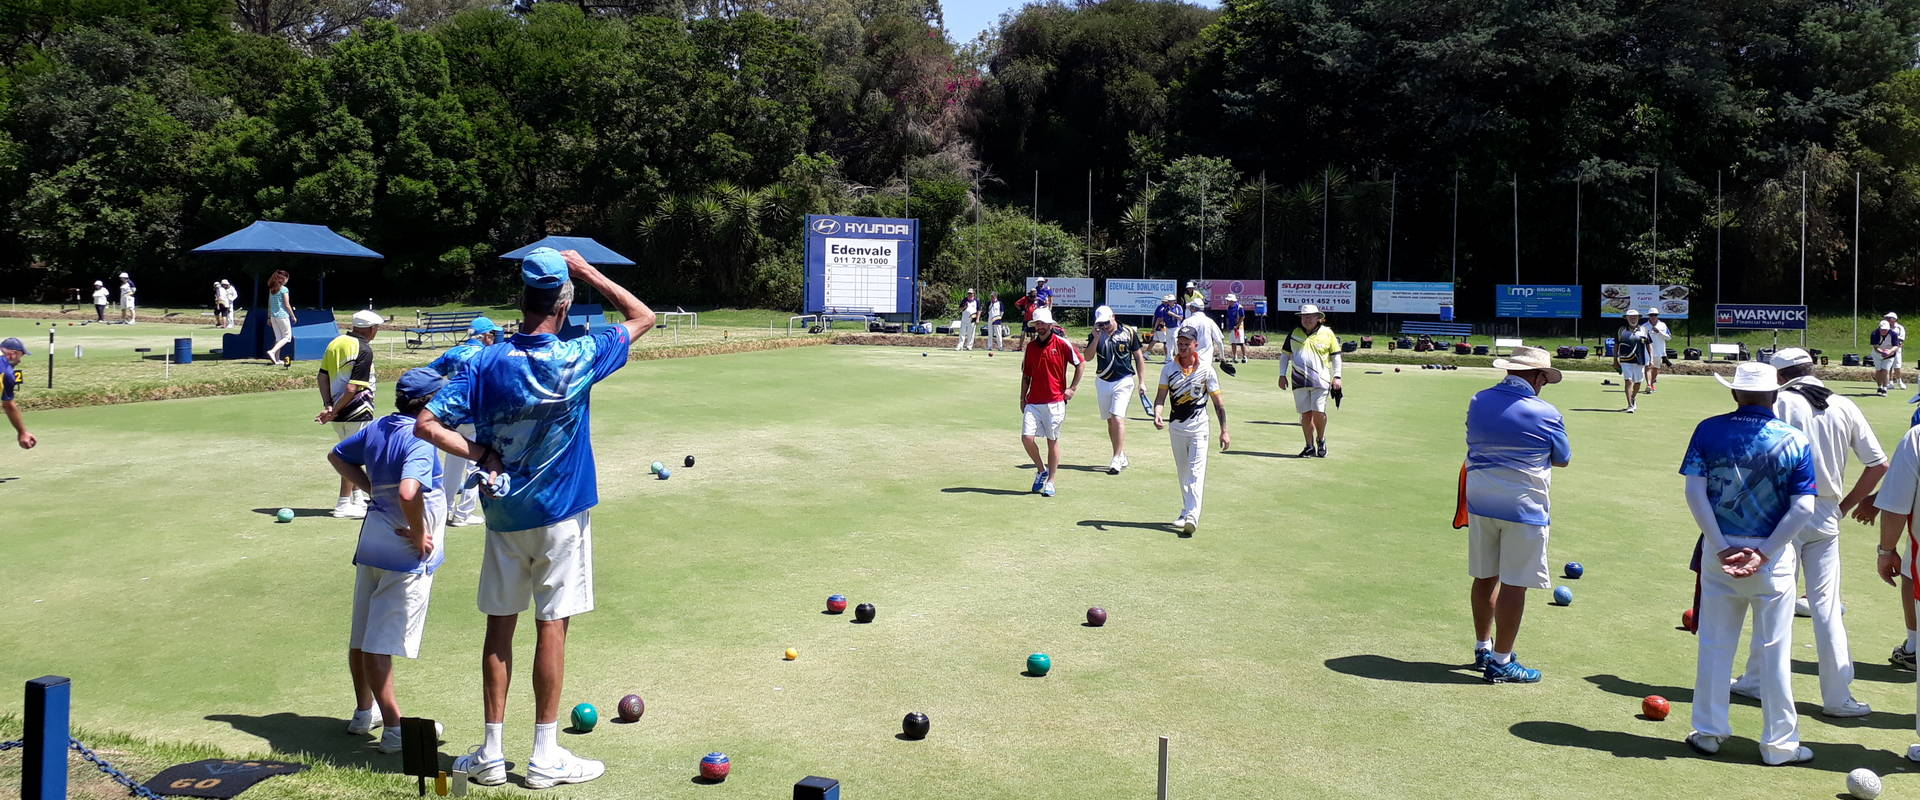 Edenvale Bowling Club